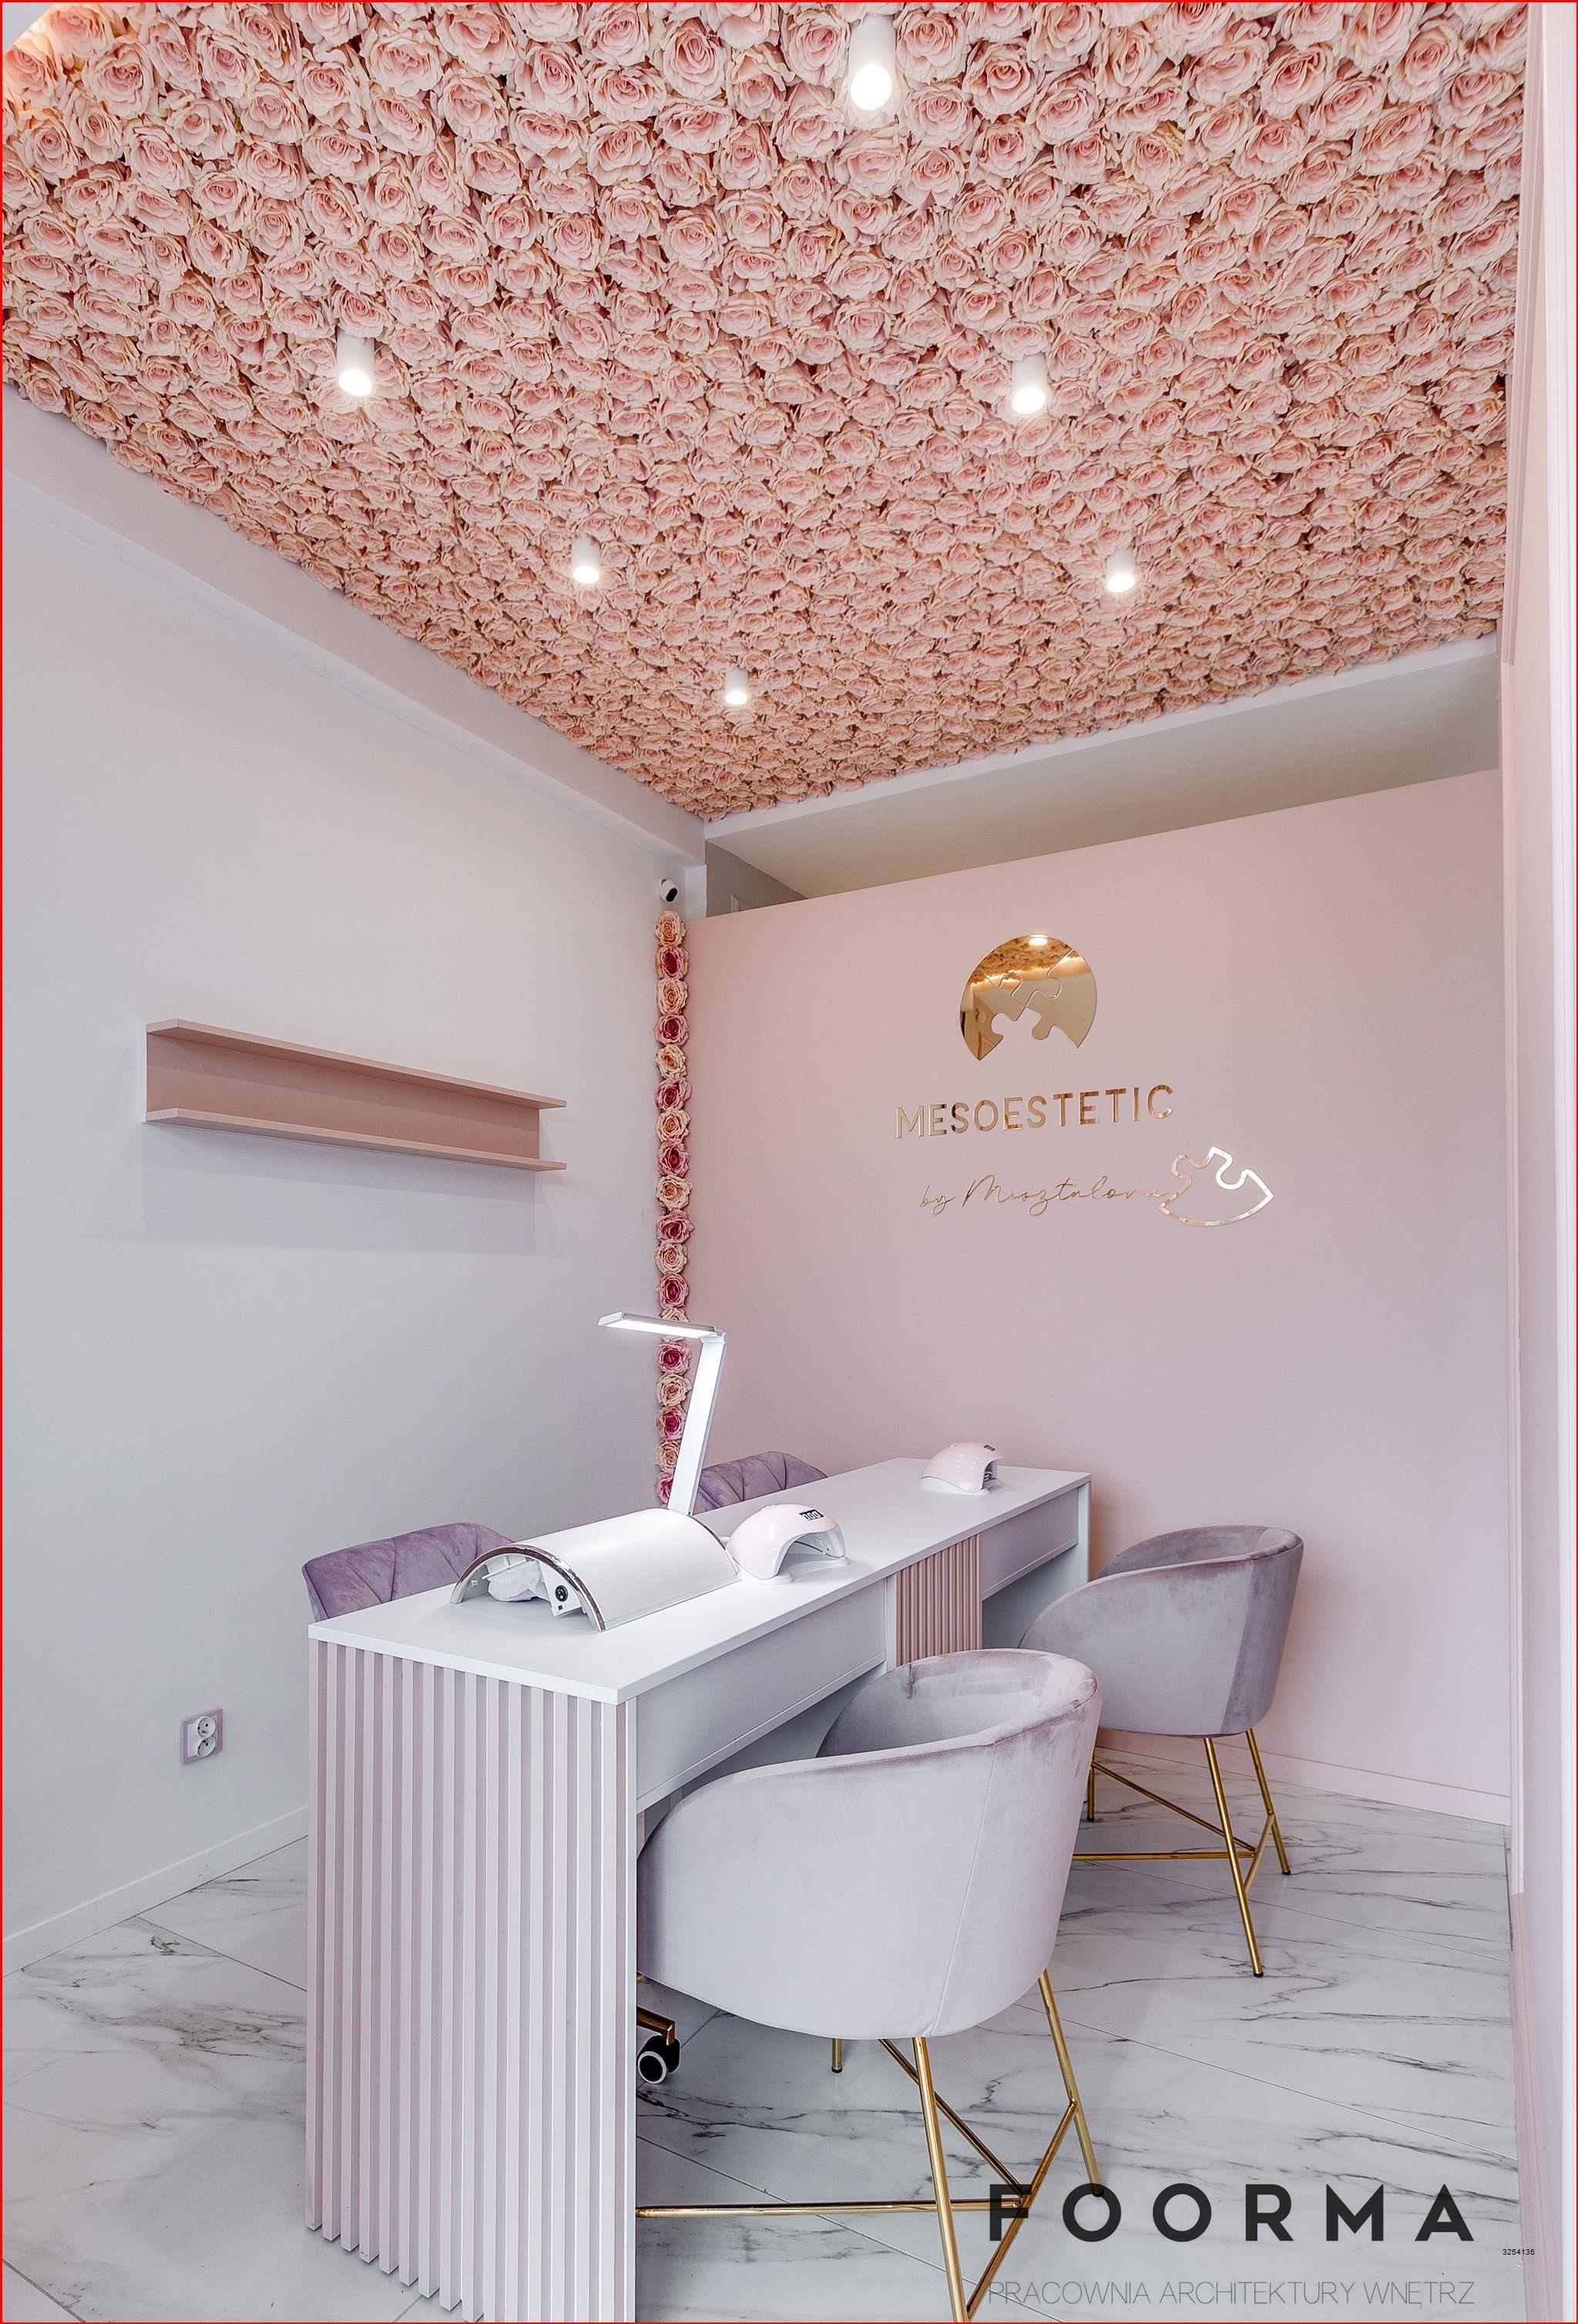 Roz Pudrowy Roz Manicure Paznokcie Beauty Room Decor Esthetics Room Beauty Room Salon